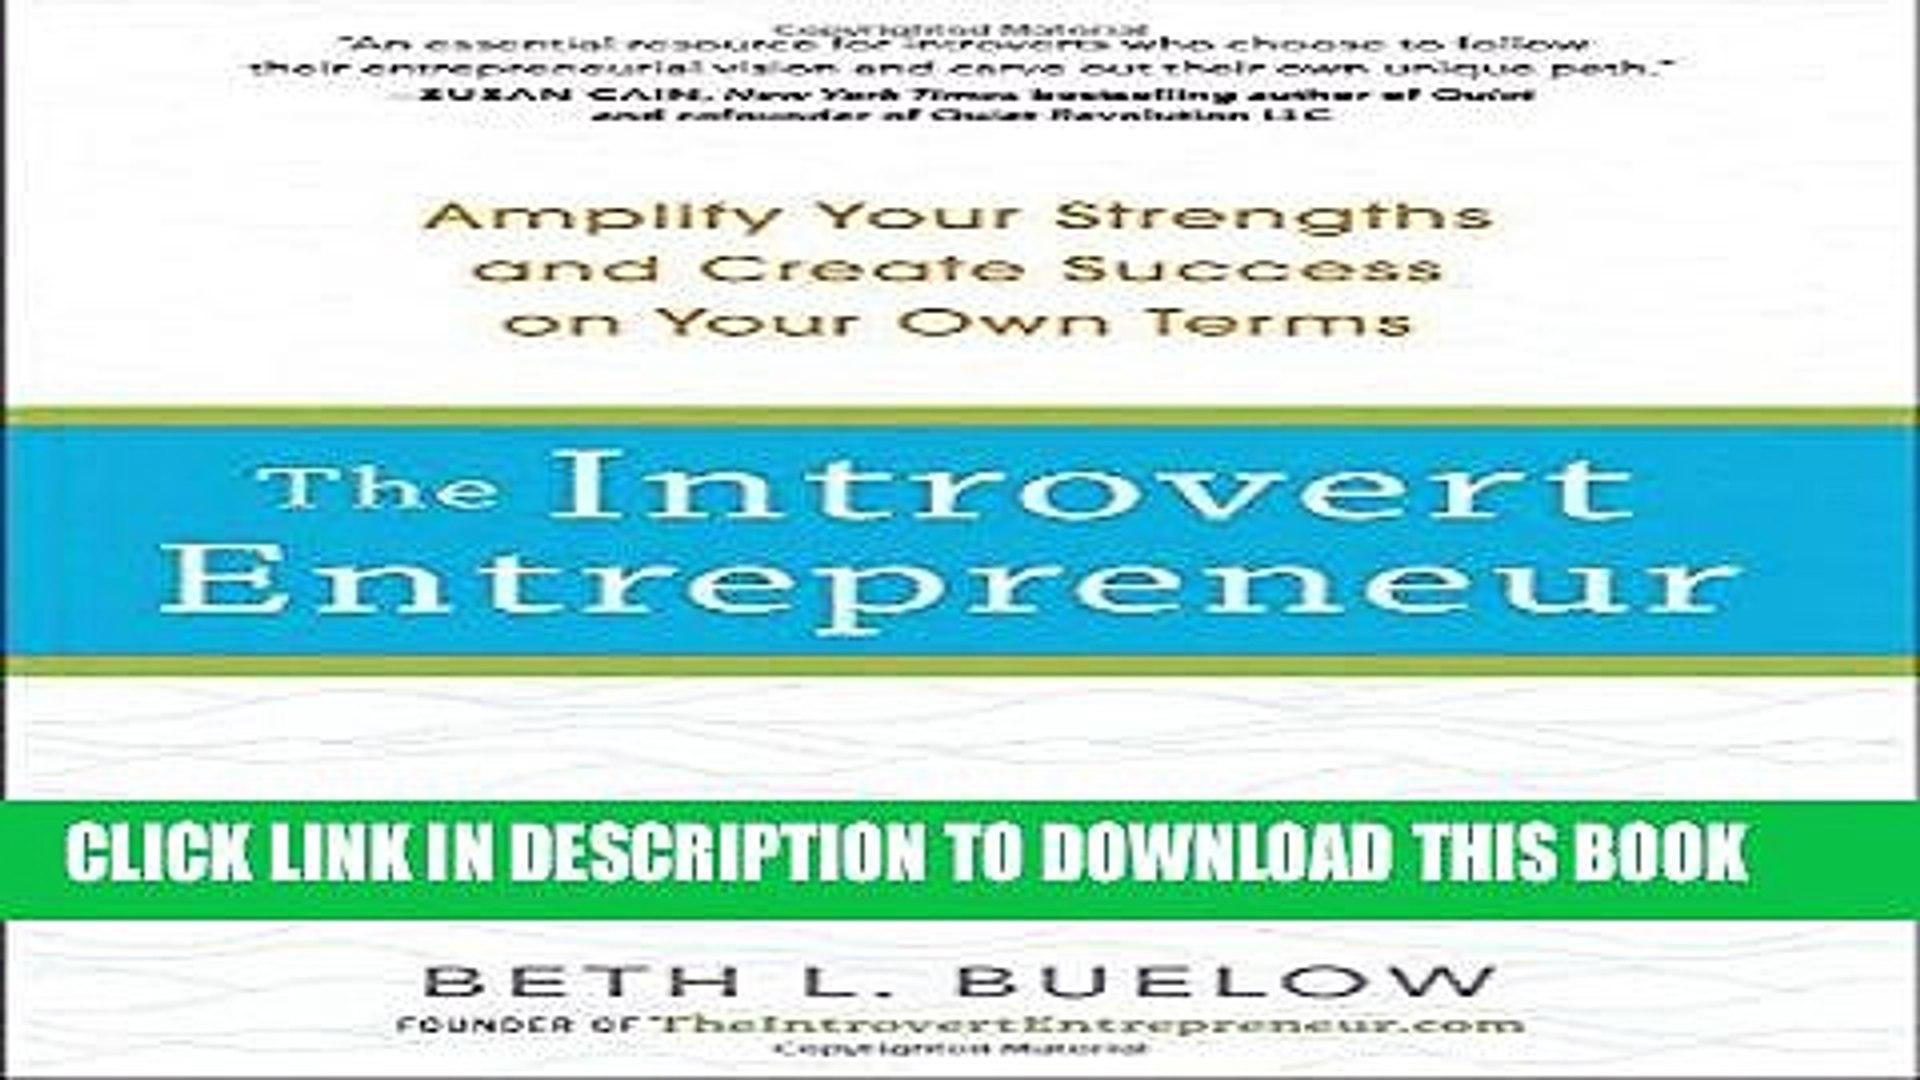 The introvert entrepreneur pdf free download windows 10